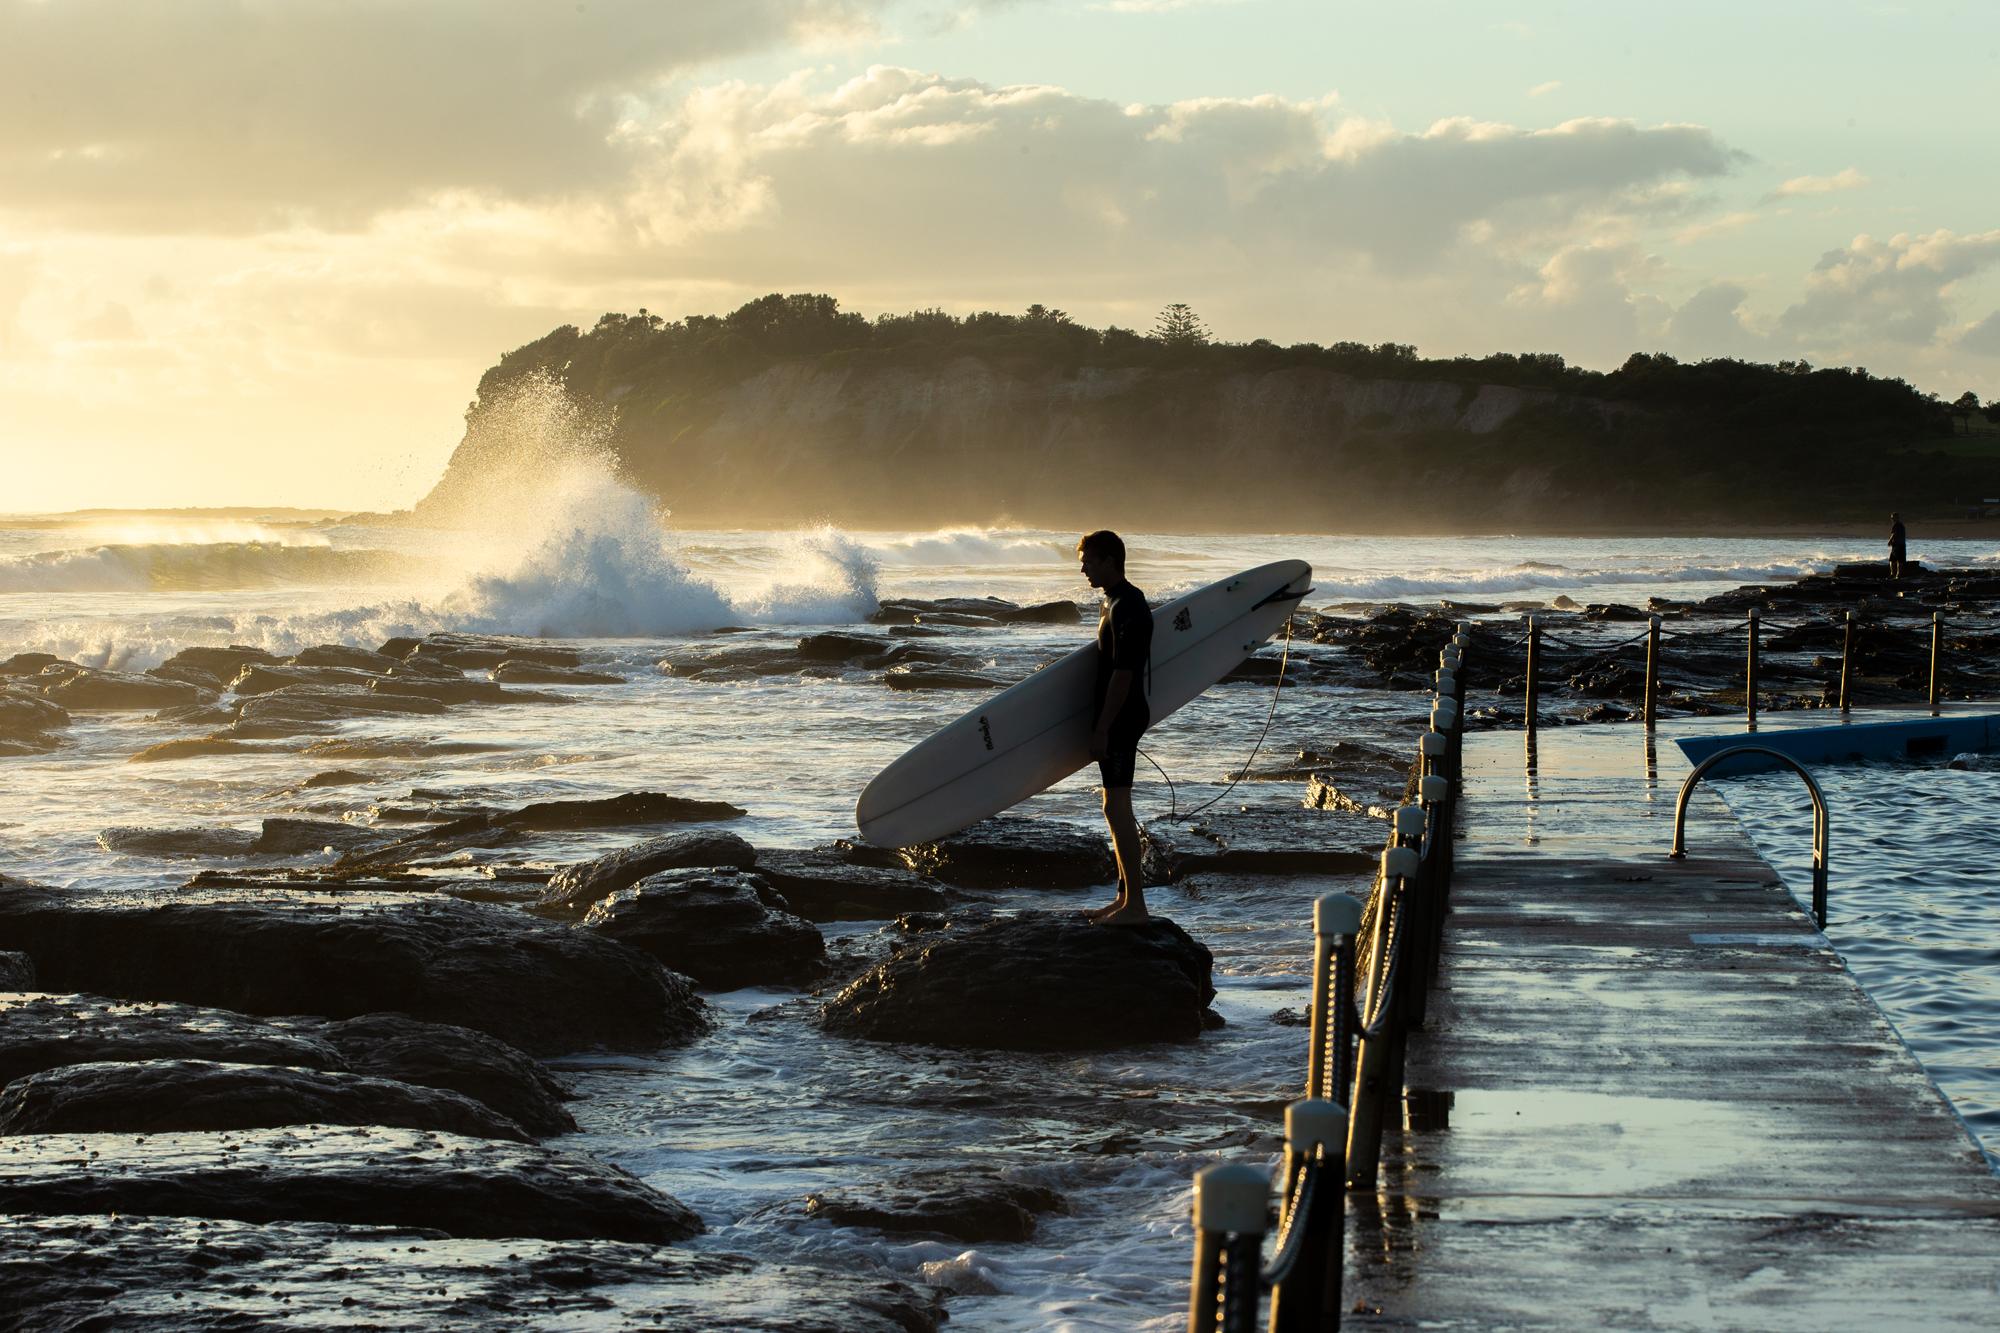 Surfer in Collaroy